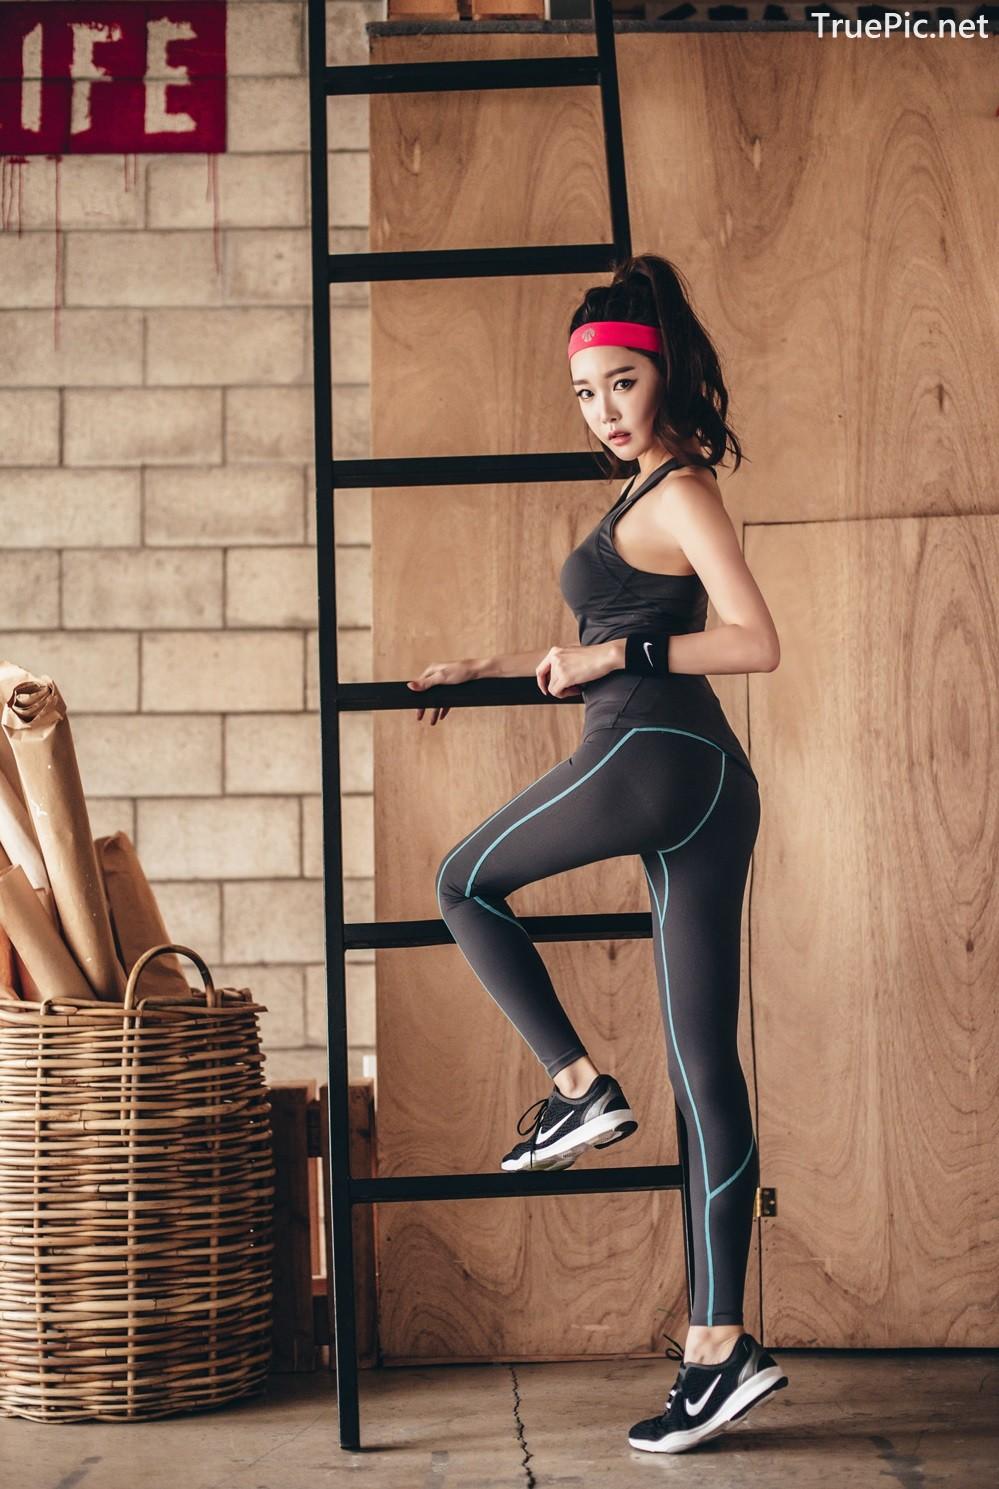 Image Korean Fashion Model - Yoon Ae Ji - Fitness Set Collection - TruePic.net - Picture-5